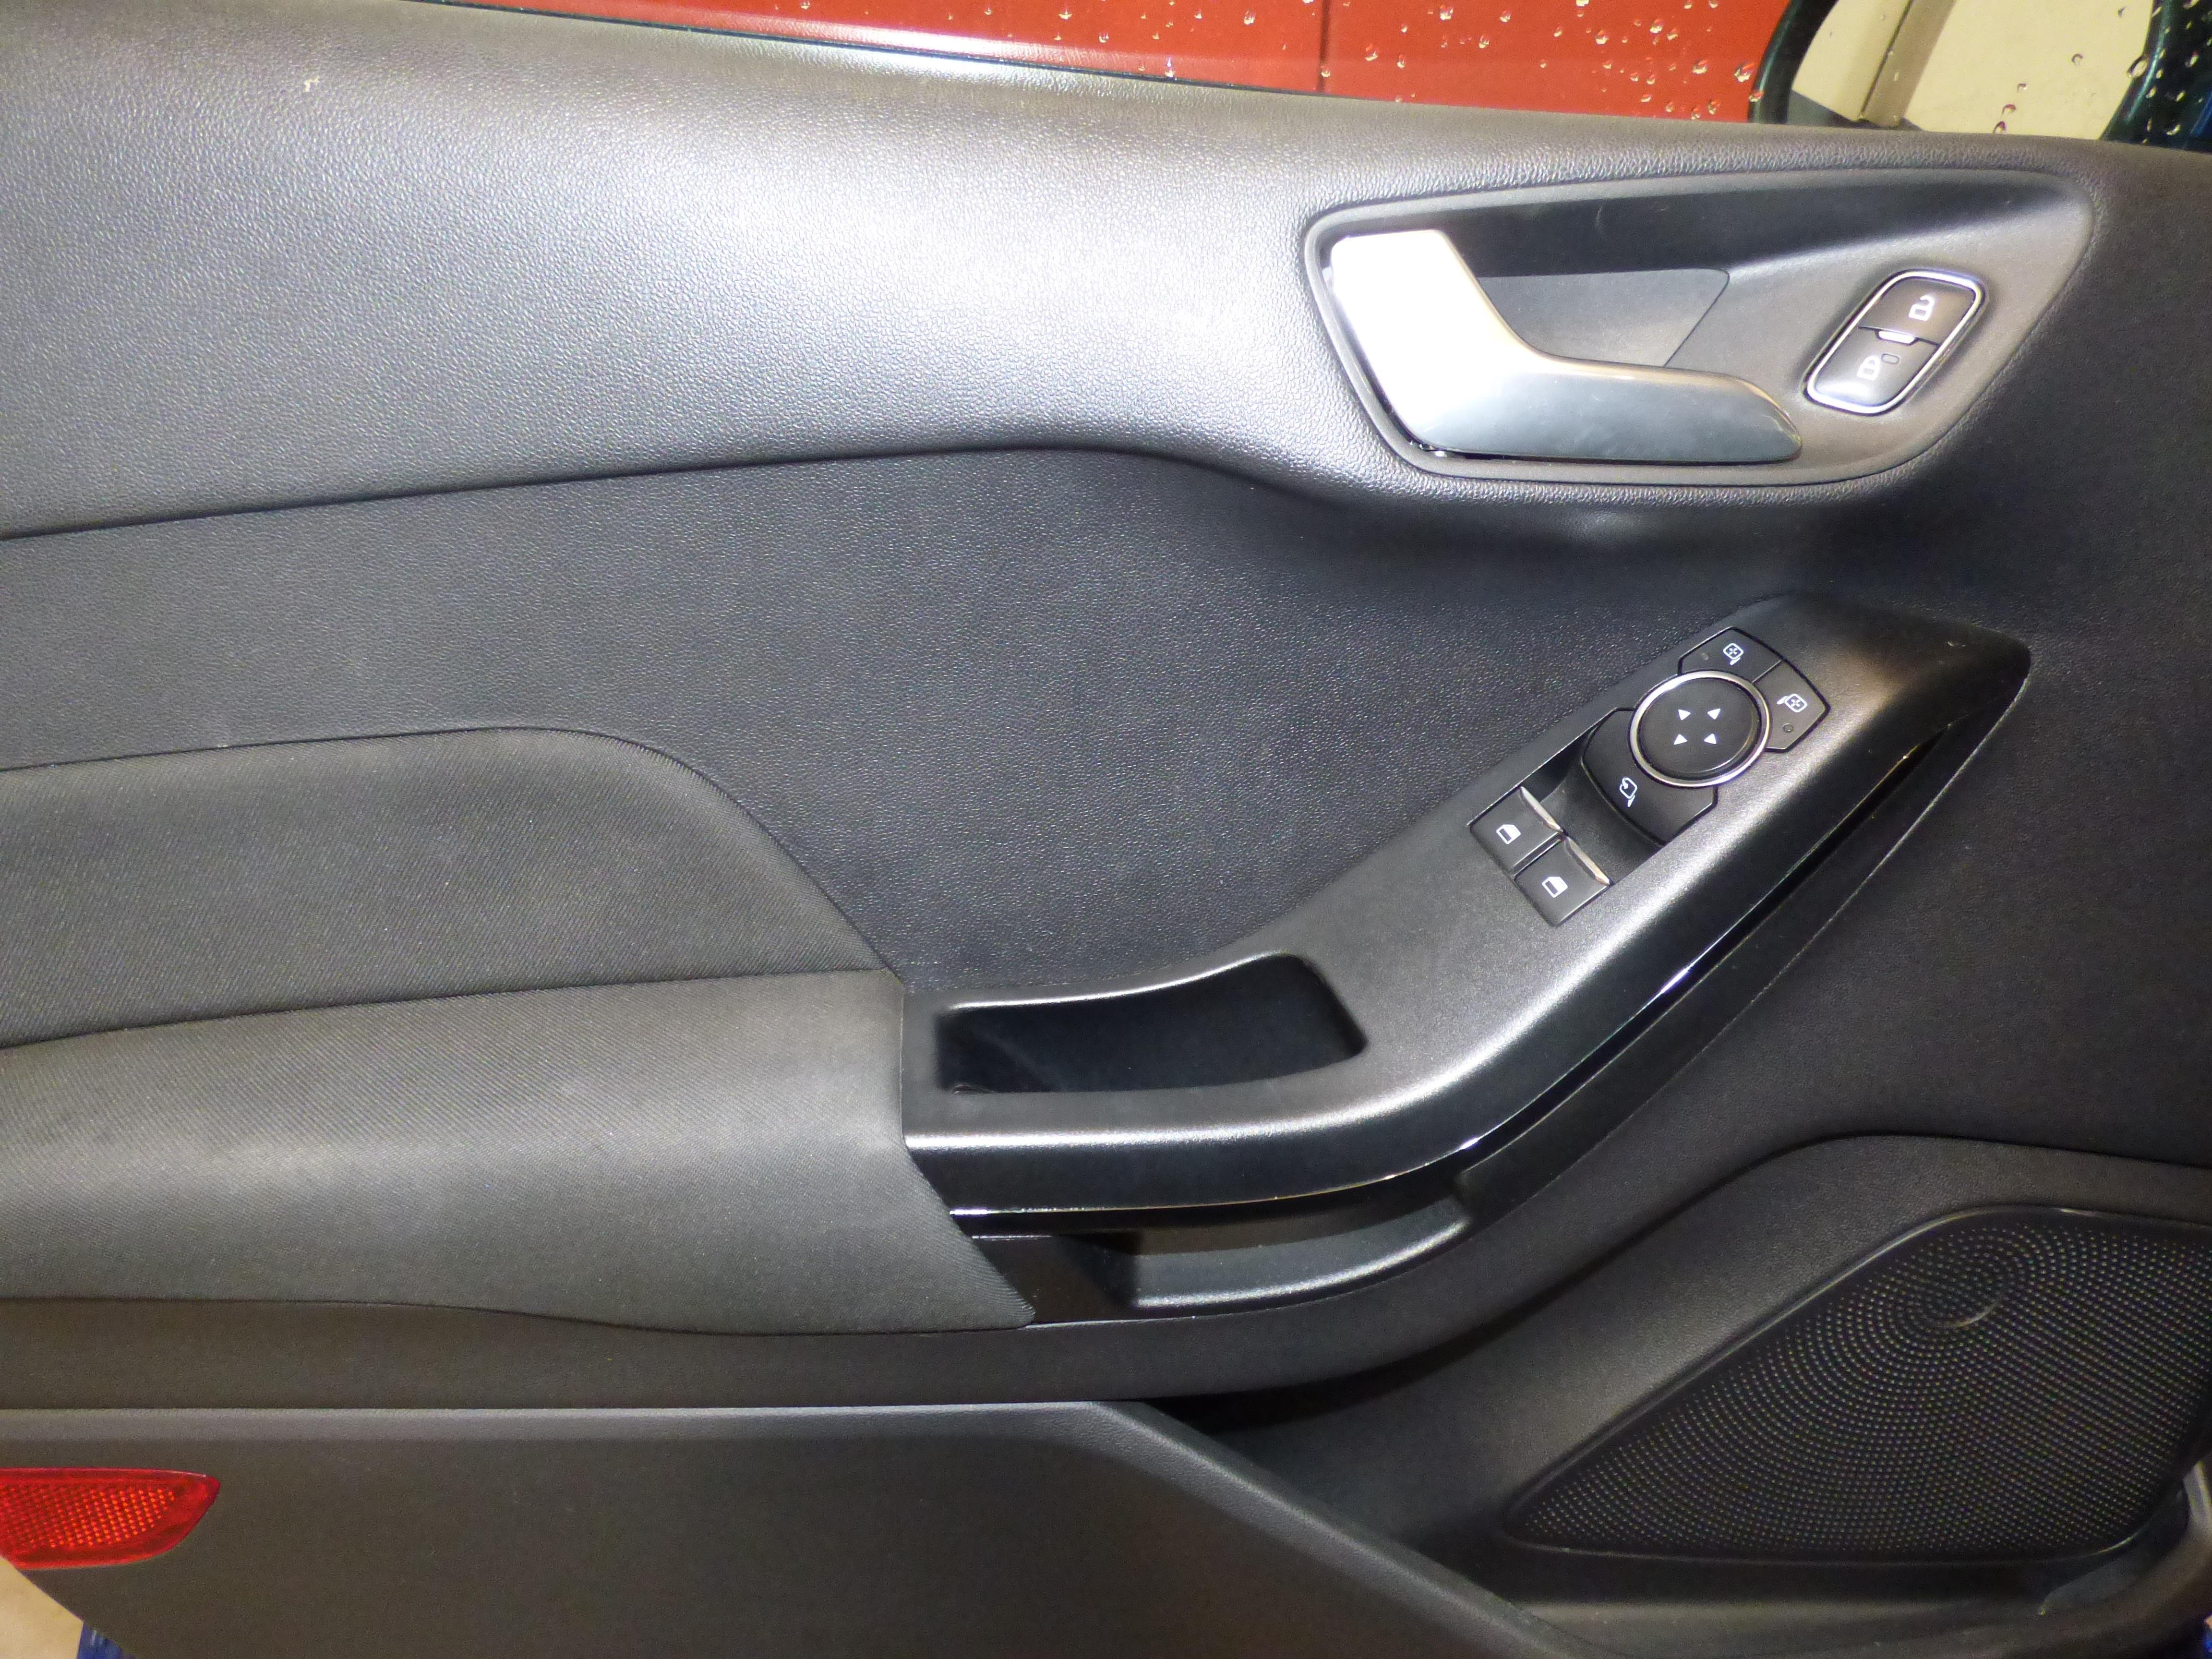 Fiesta 1.1 TIVCT 85CV Trend+ 5